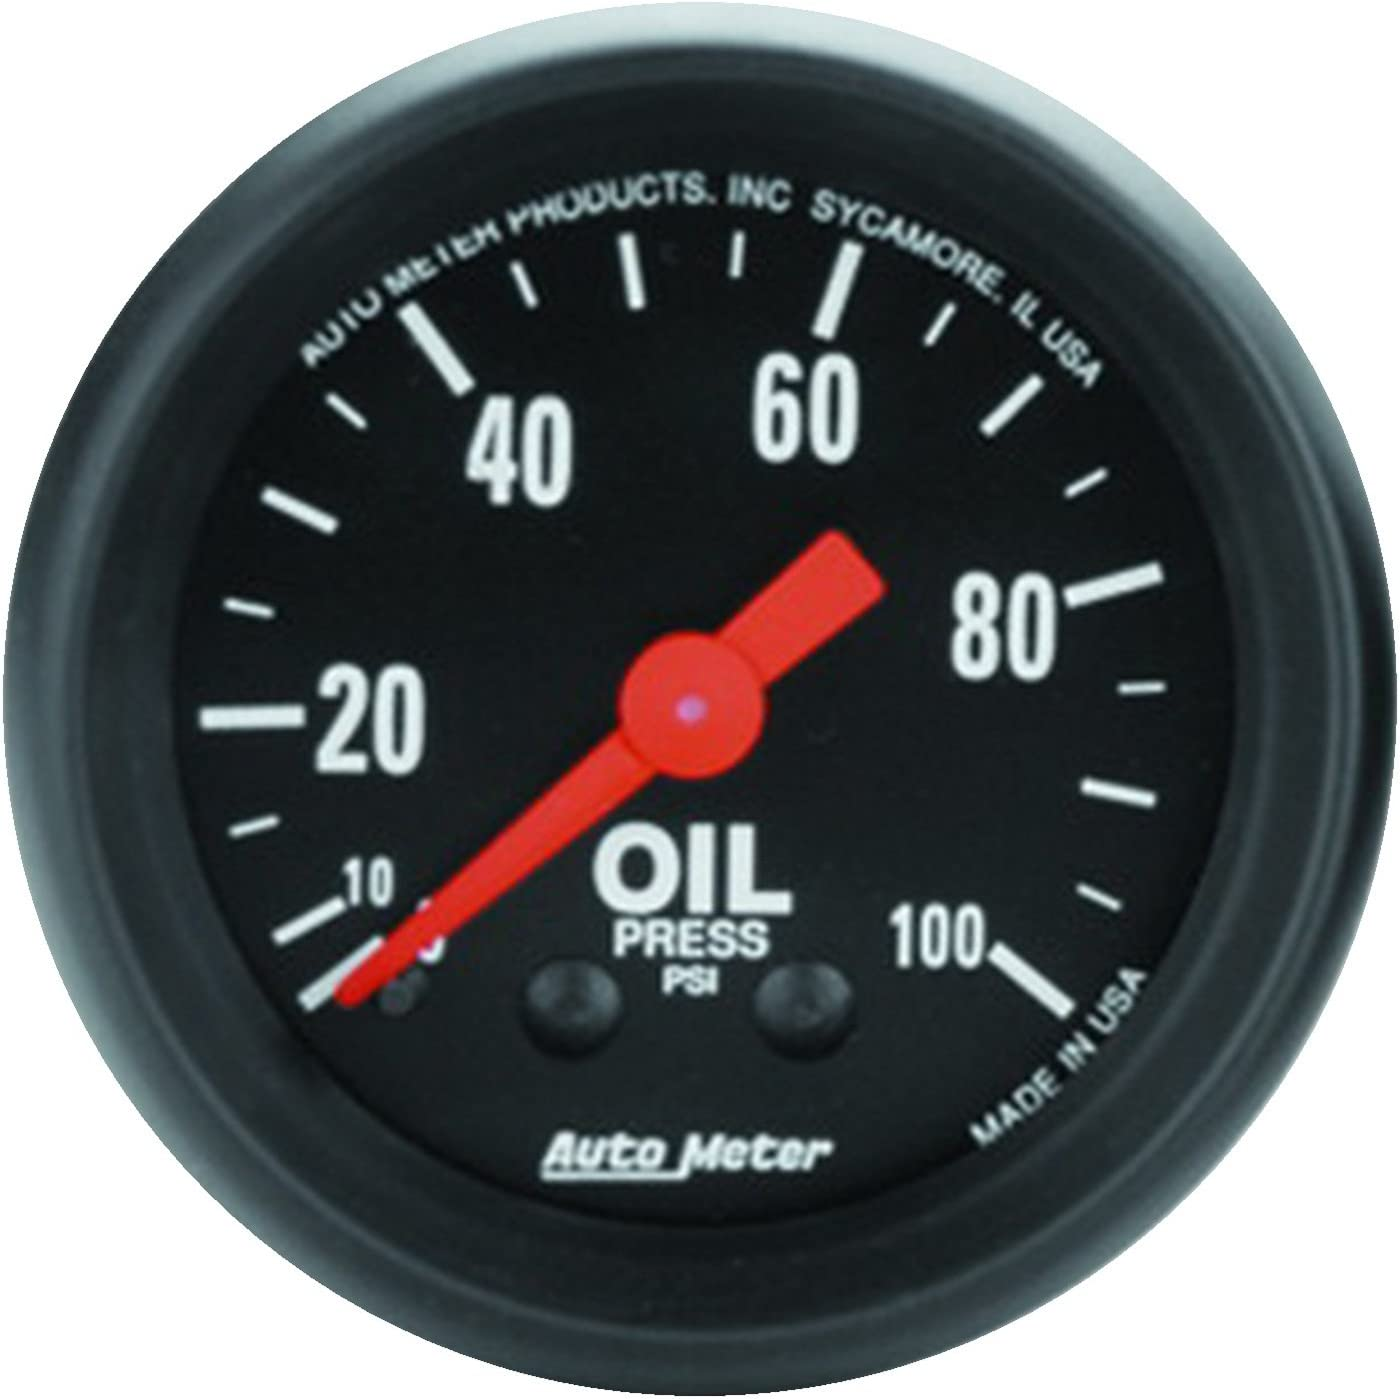 Auto Meter 1429 Designer Black Mechanical Oil Pressure Gauge